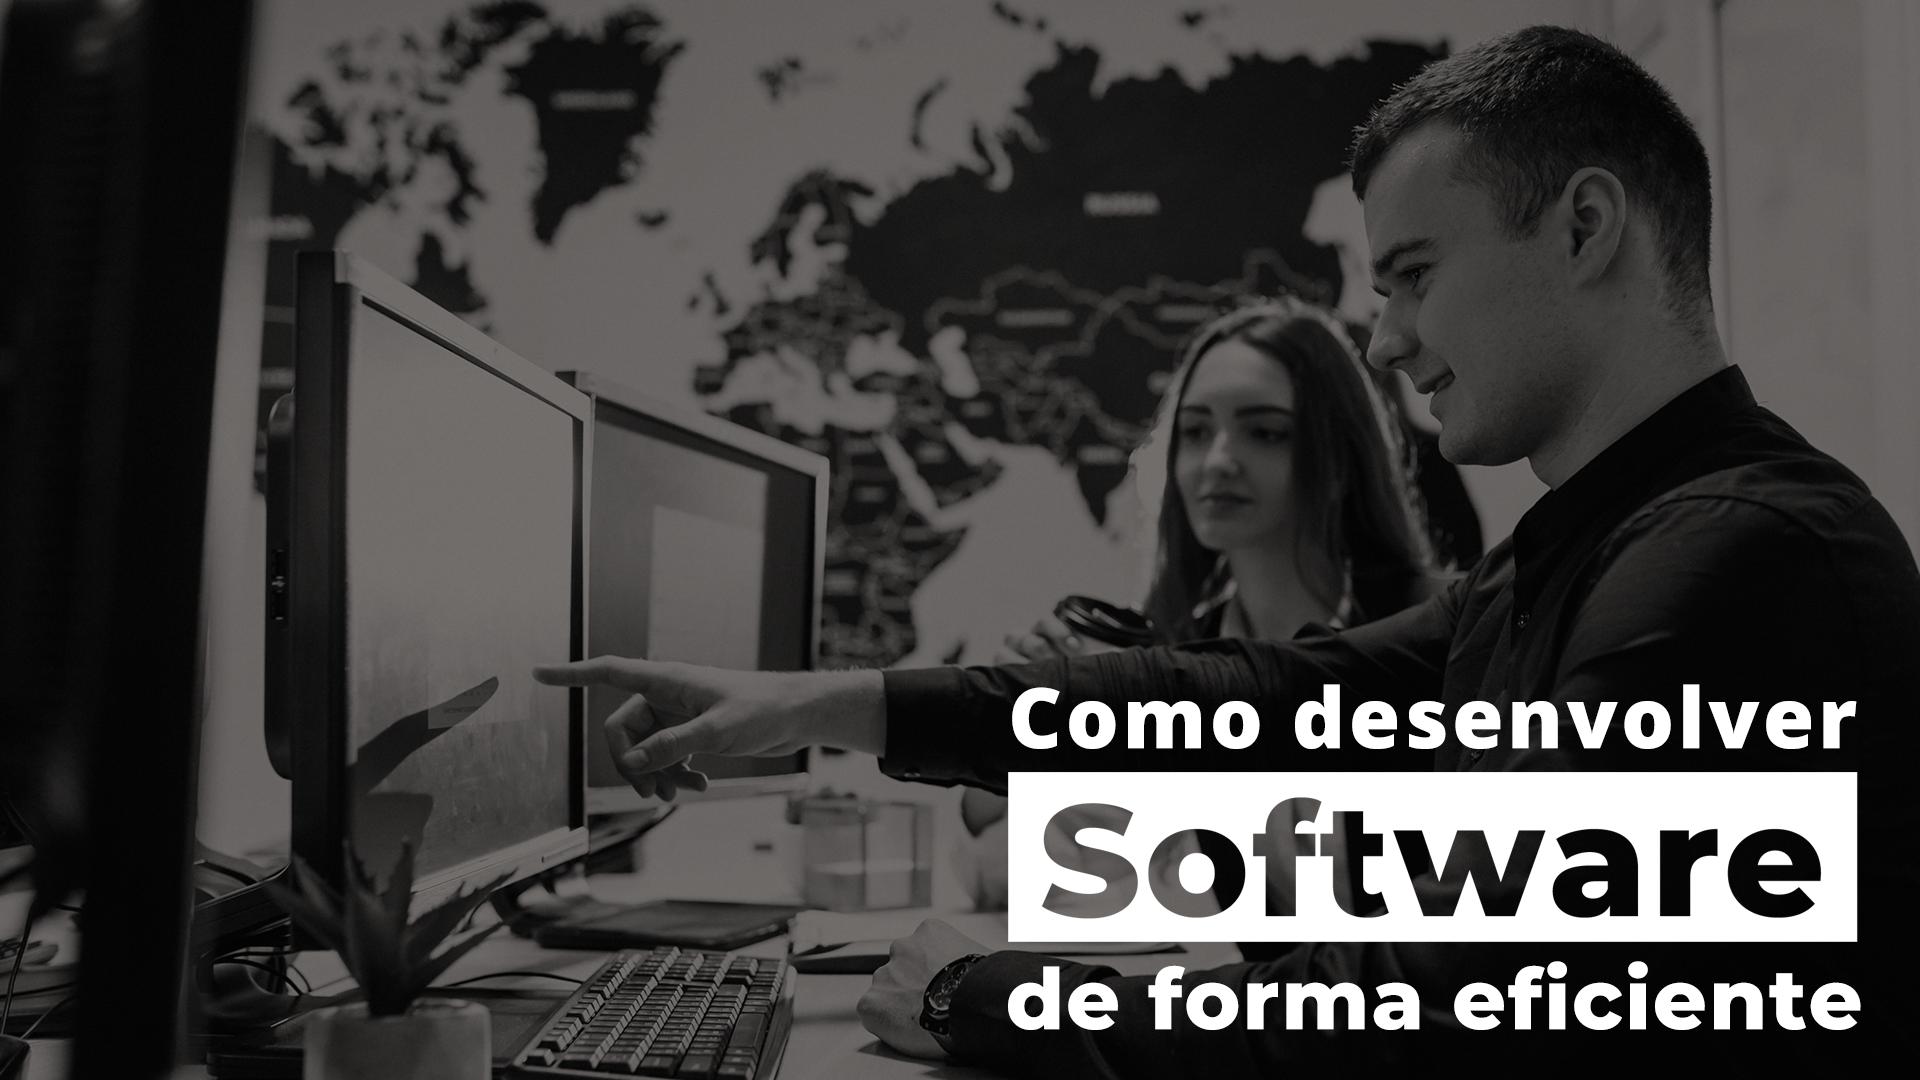 Como desenvolver software de forma eficiente